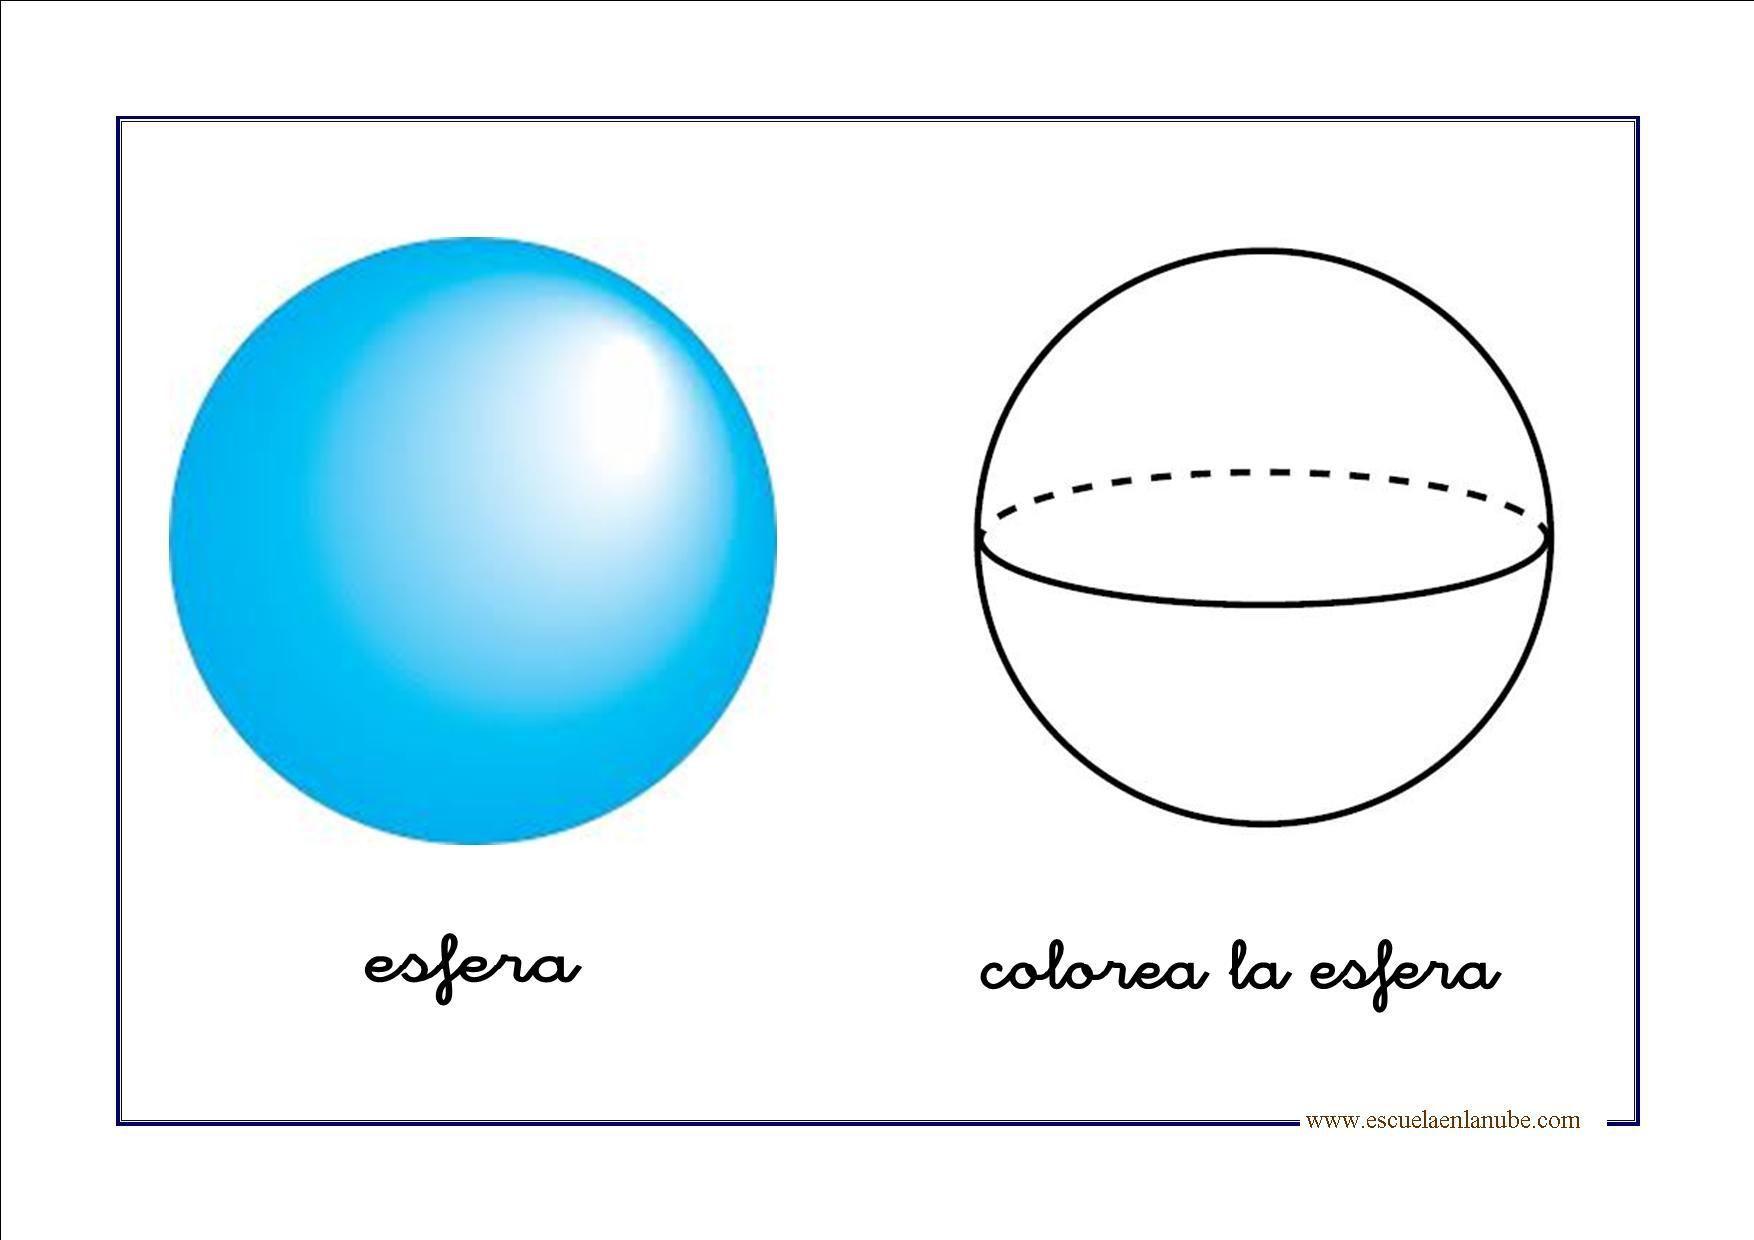 Figuras Geometricas Esfera 1 754 1 240 Pixeles